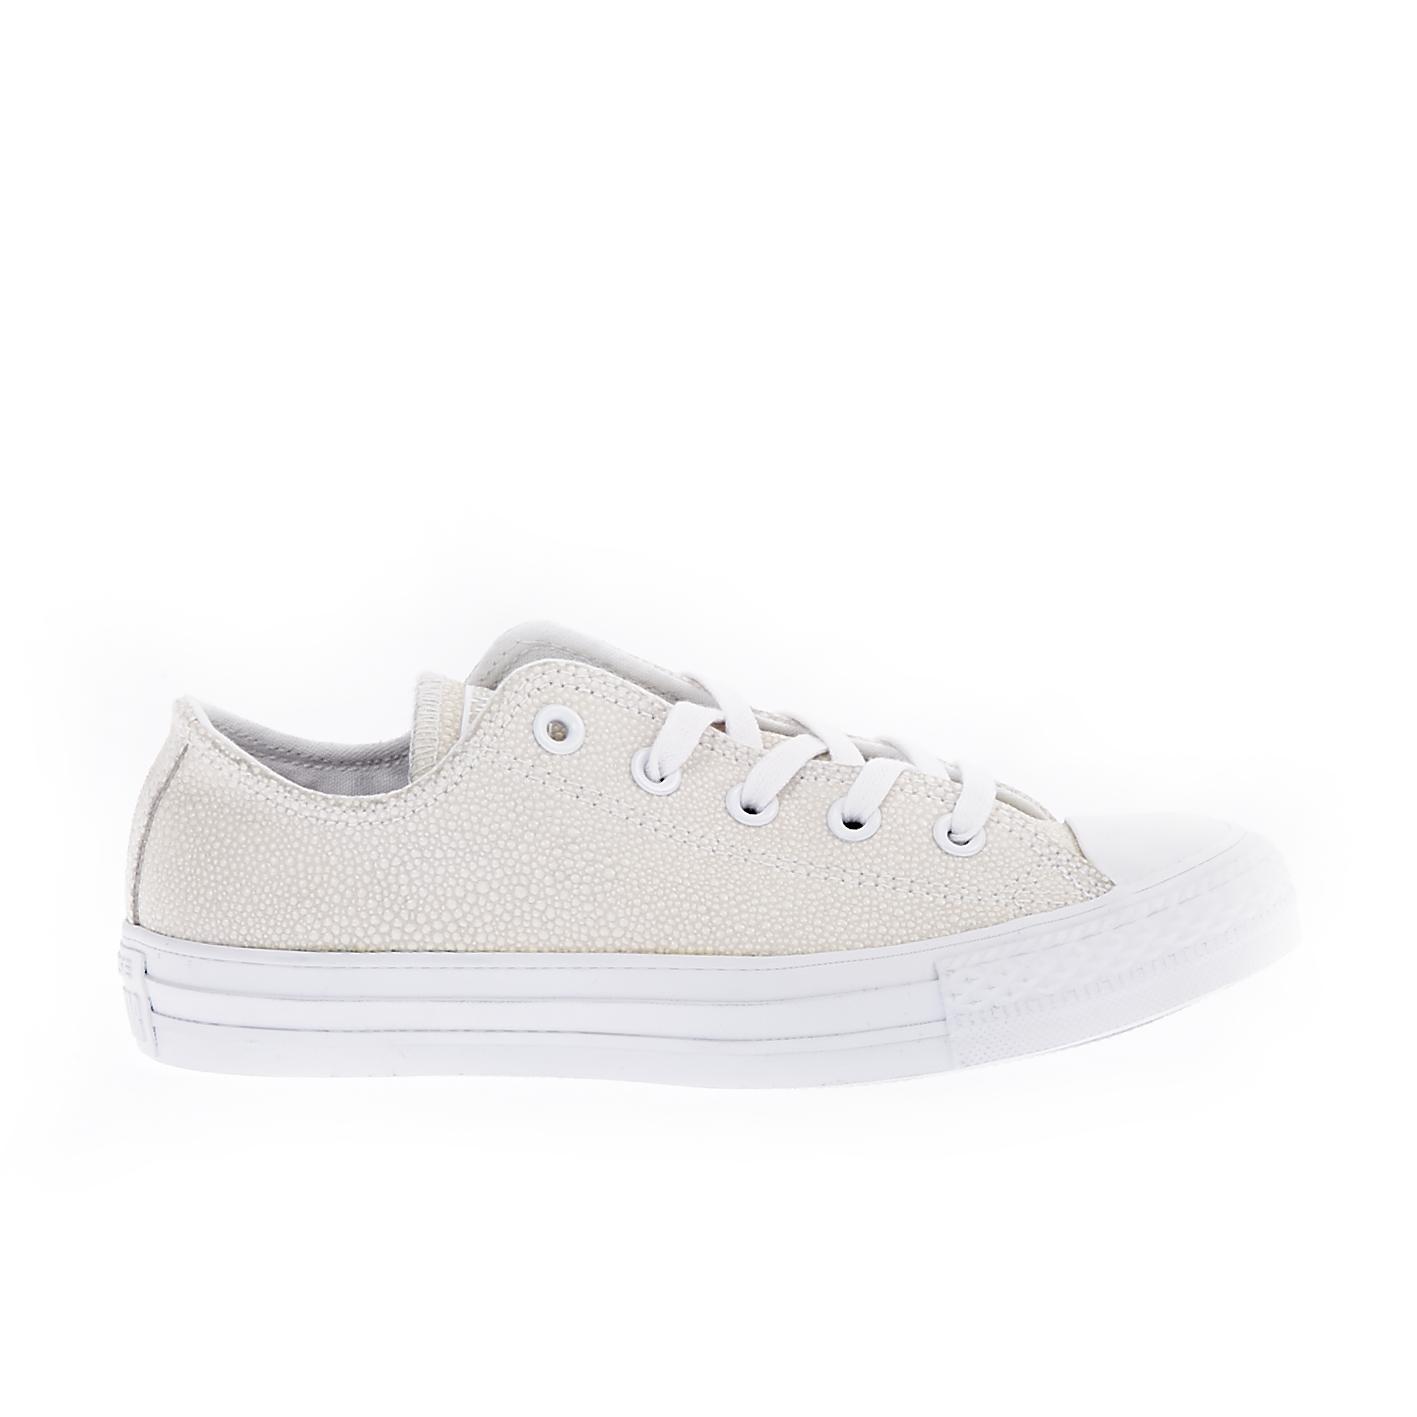 CONVERSE - Γυναικεία παπούτσια Chuck Taylor All Star Ox μπεζ